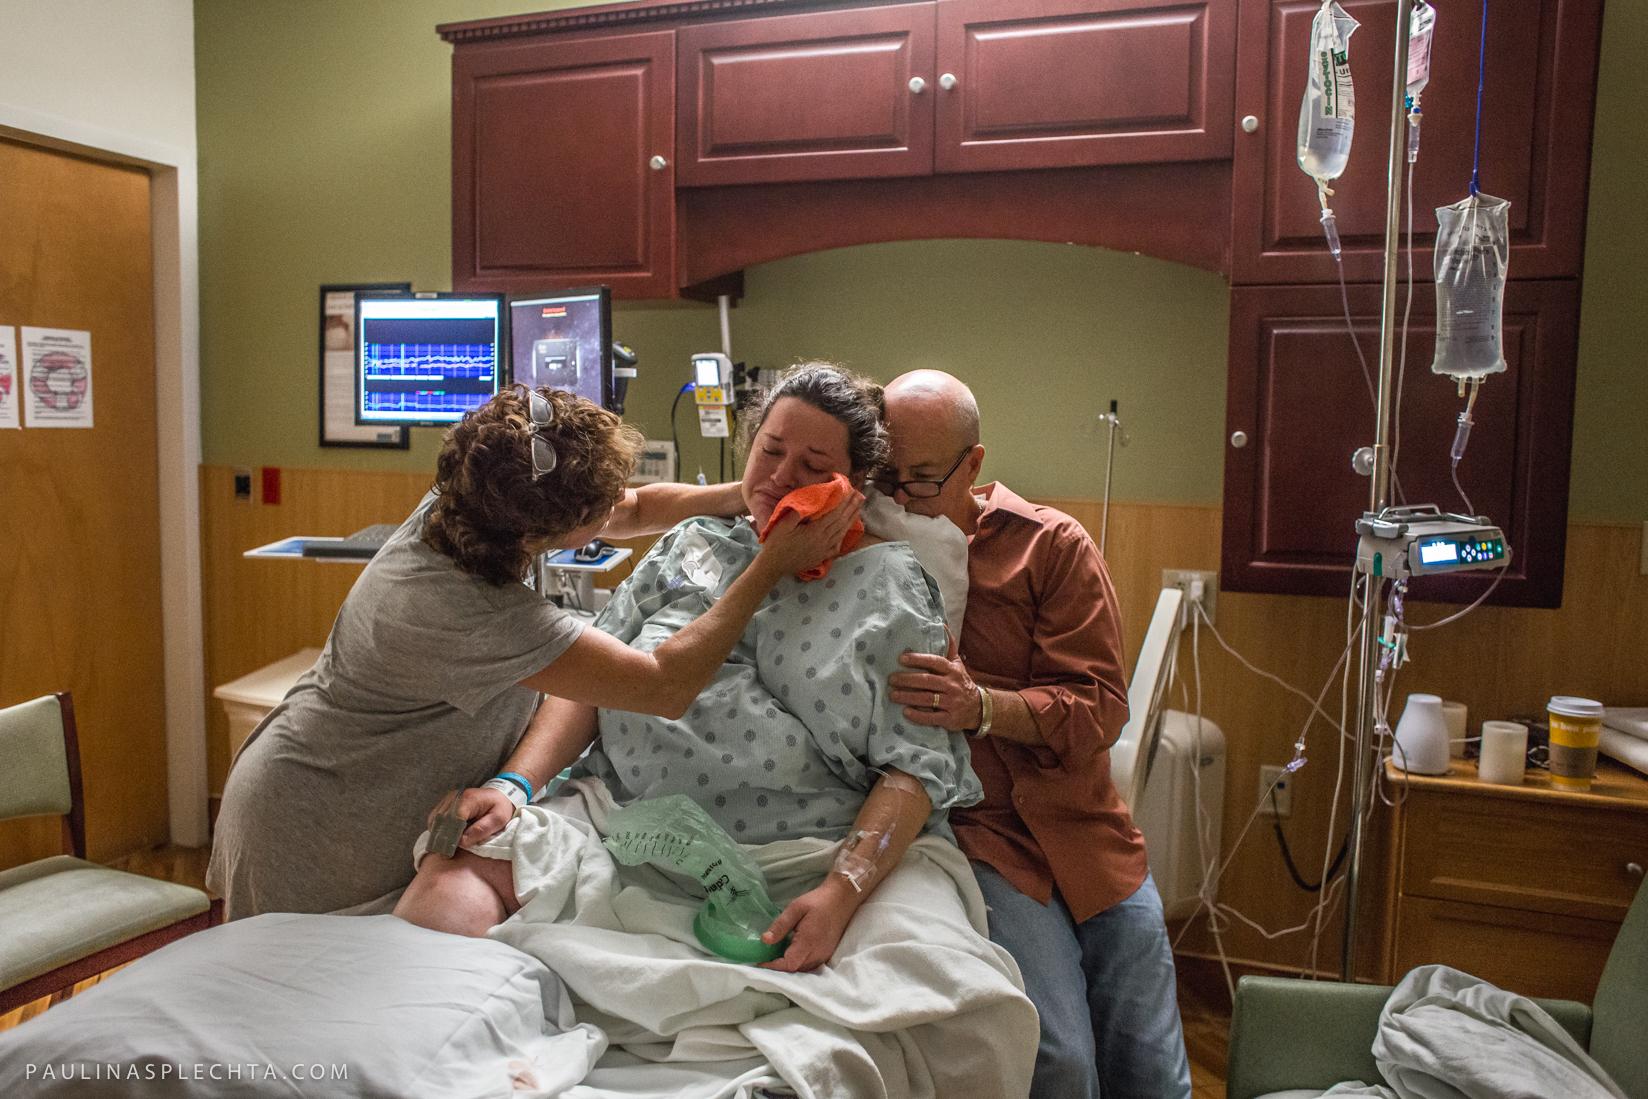 greenpath-baby-zika-babycenter-center-birth-photographer-miramar-go-into-labor-miami-boca-shelter-regional-pediatrician-broward-36-weeks-pregnant-haiti-hurricane-matthew-7.jpg